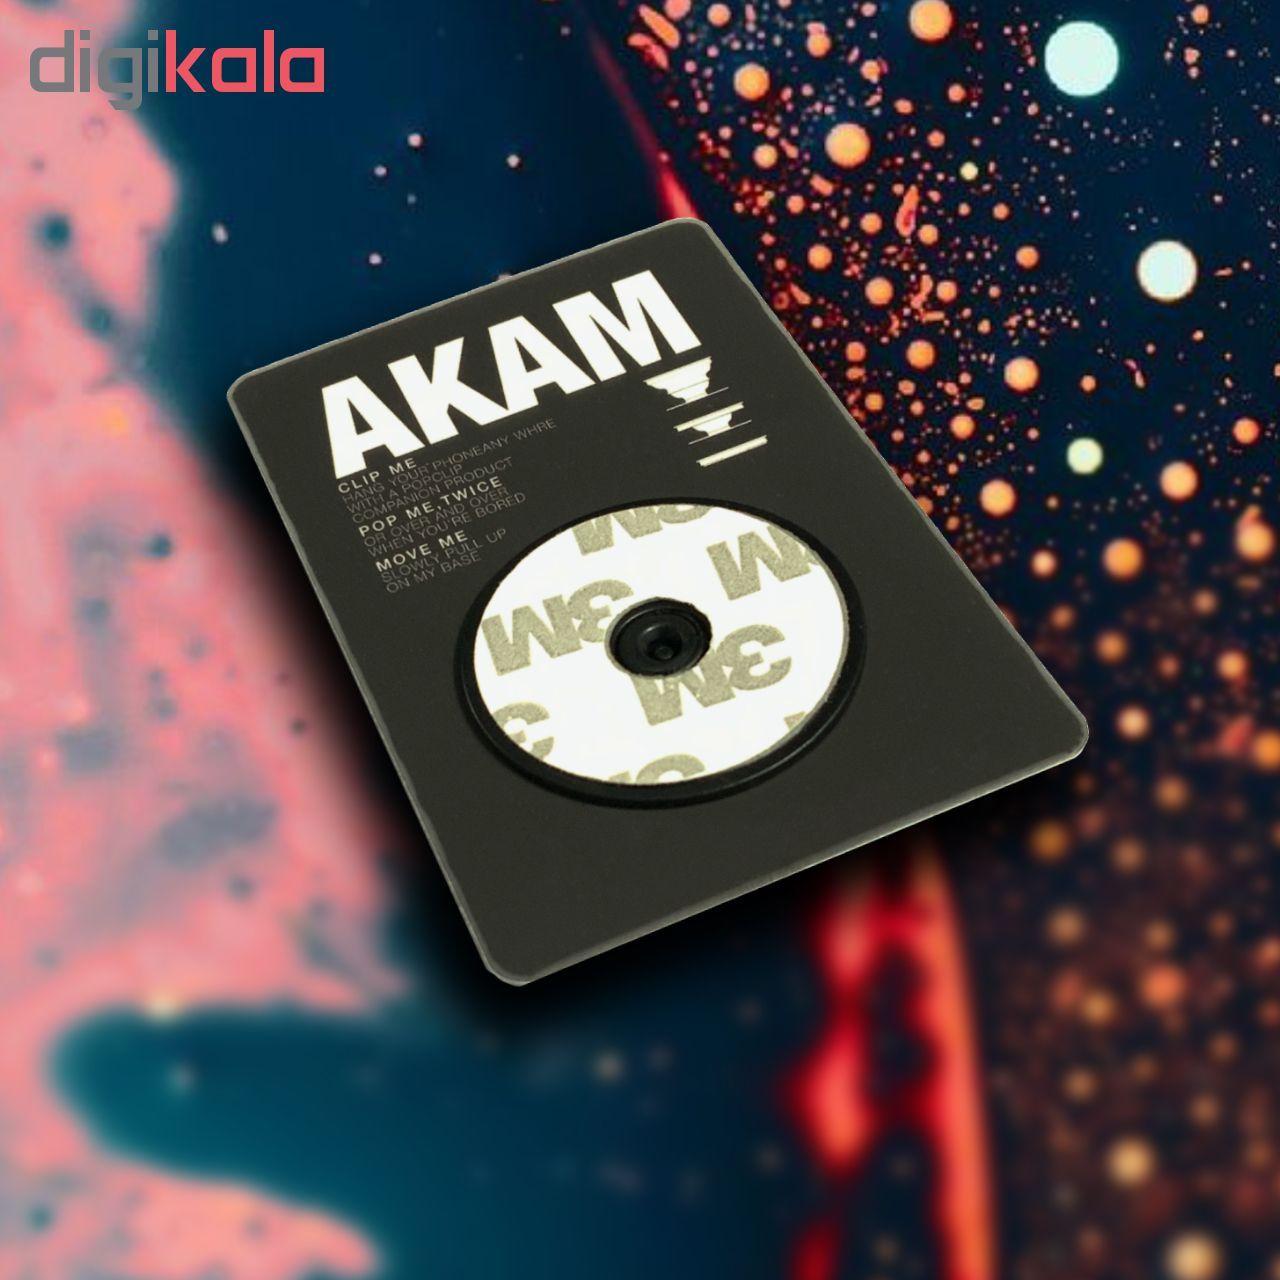 پایه نگهدارنده گوشی  موبایل پاپ سوکت آکام مدل APS0014 main 1 3